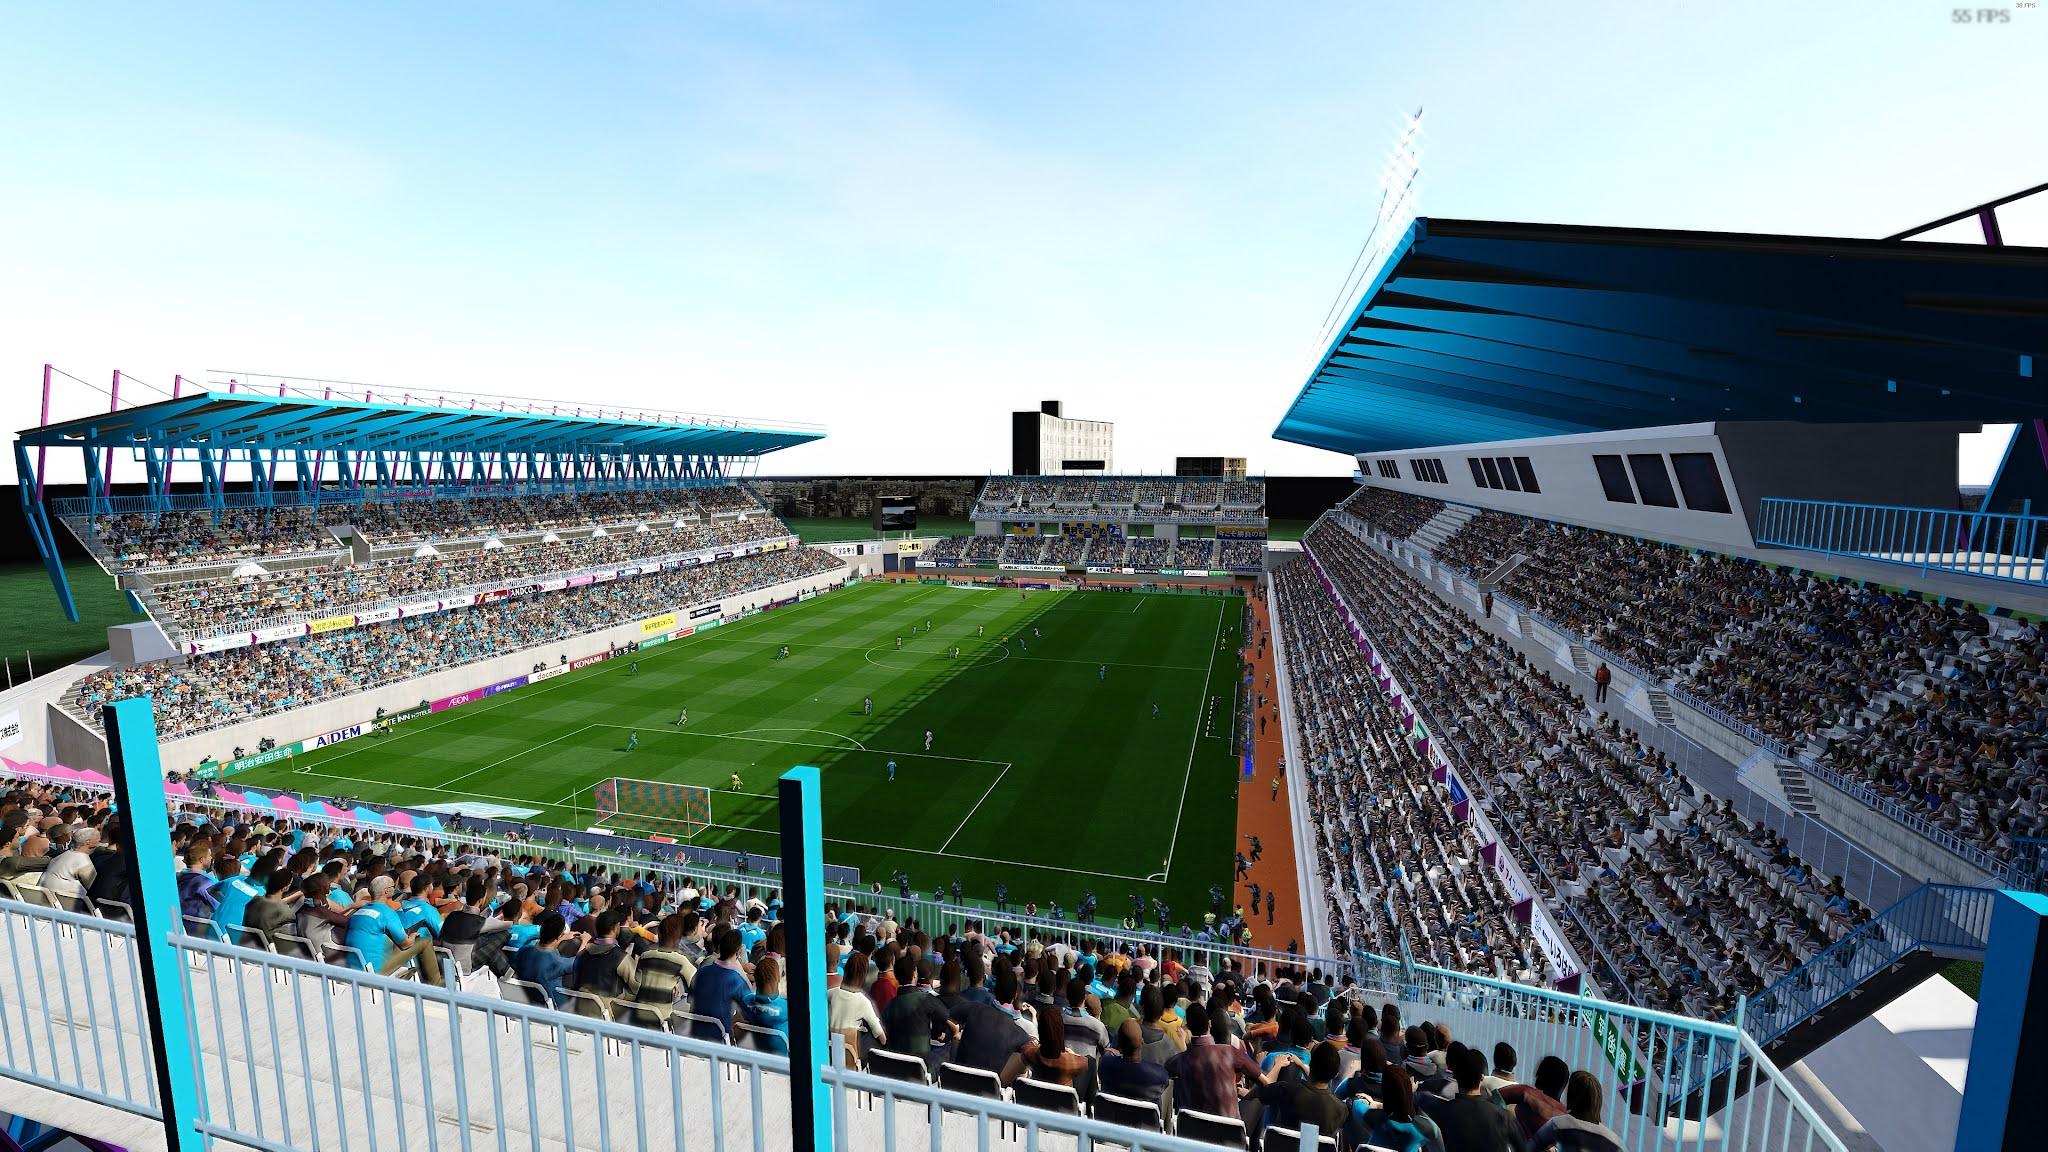 PES 2021 Ekimae Real Estate Stadium (Tosu)